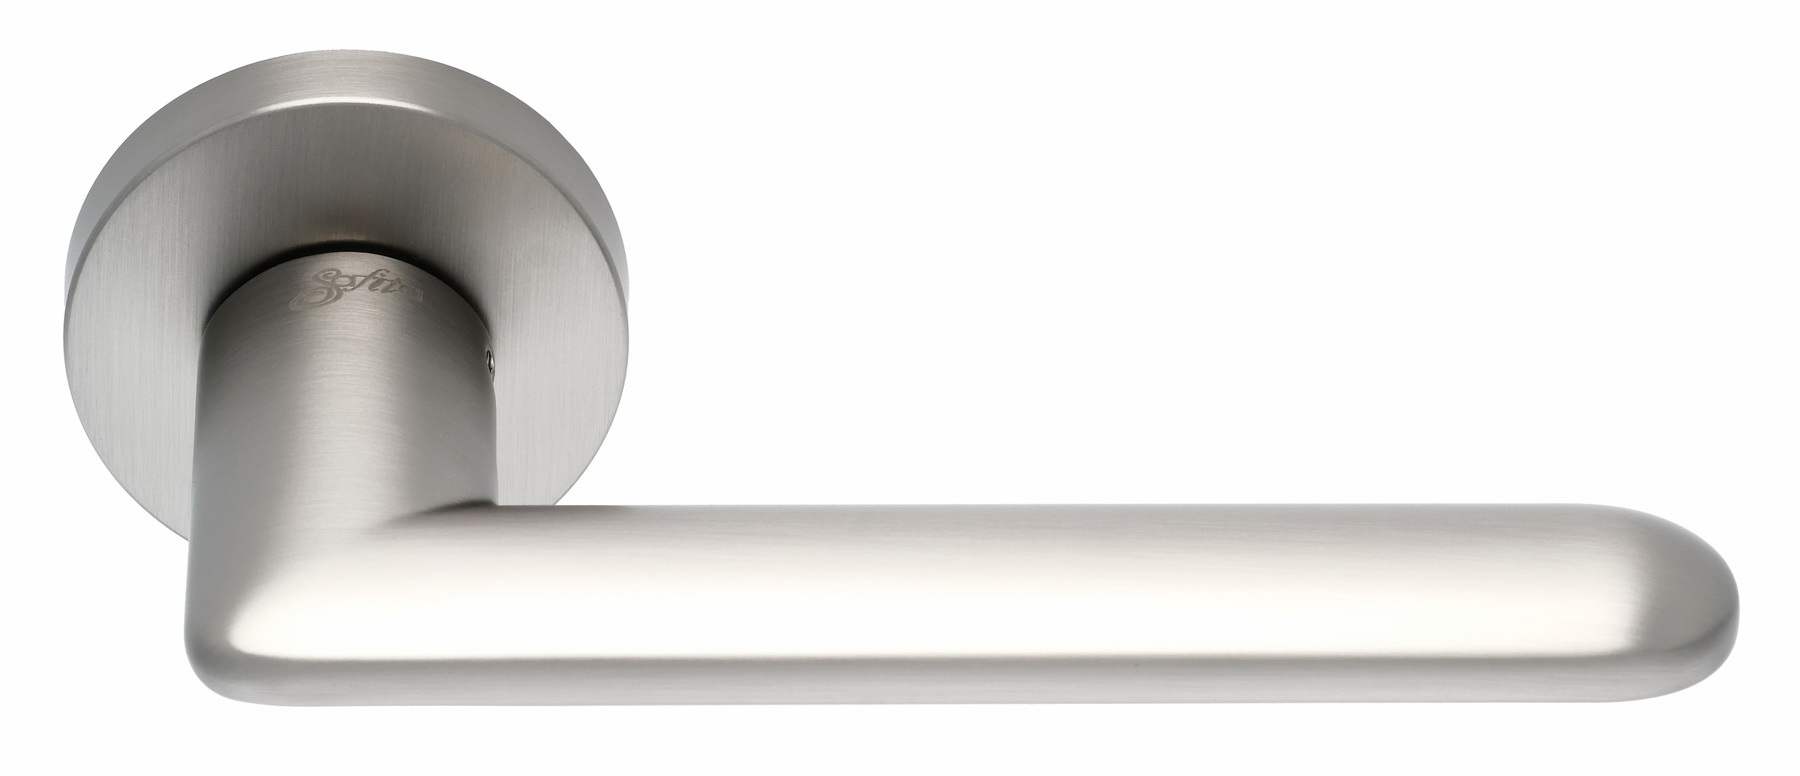 Safita COMET MSN Ручка на розетке